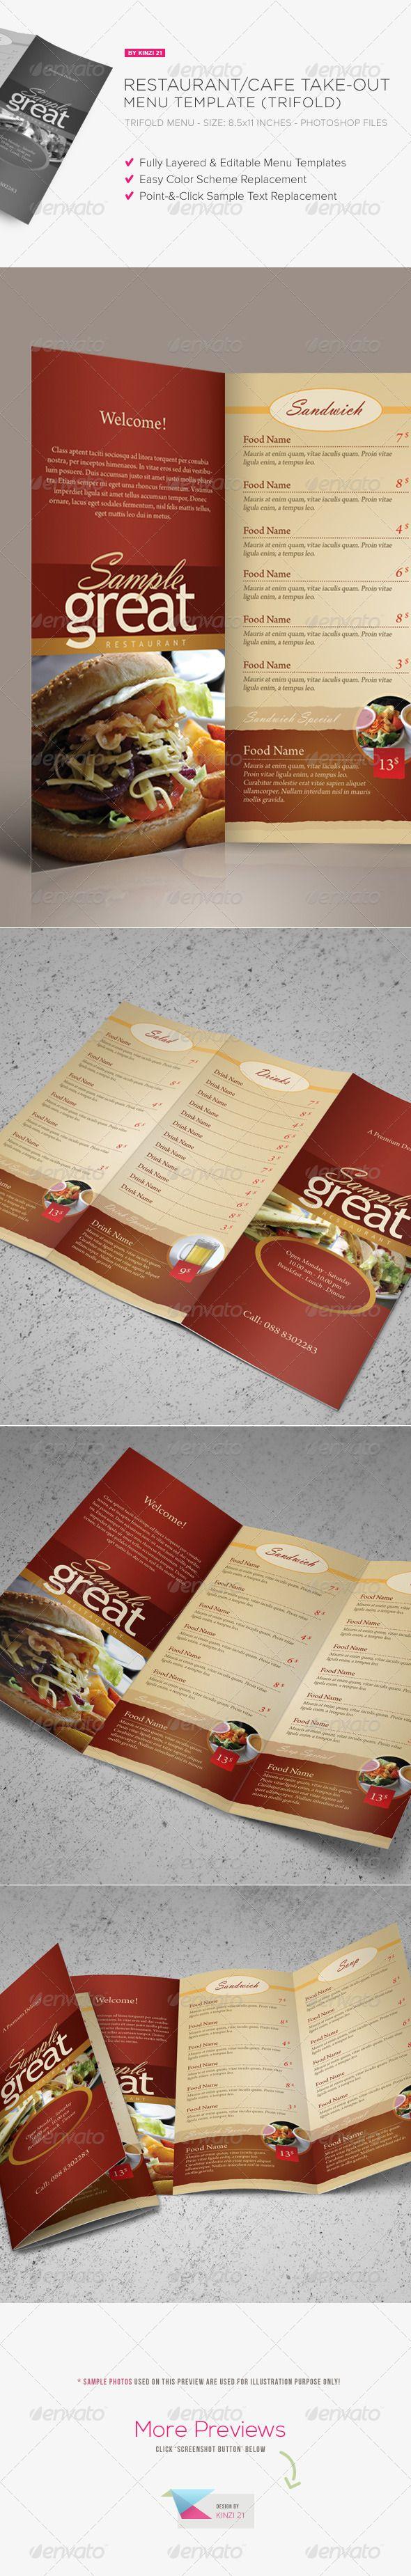 Restaurant / Cafe Take-out Menu Template - Food Menus Print Templates Download here : http://graphicriver.net/item/restaurant-cafe-takeout-menu-template/160495?s_rank=1526&ref=Al-fatih